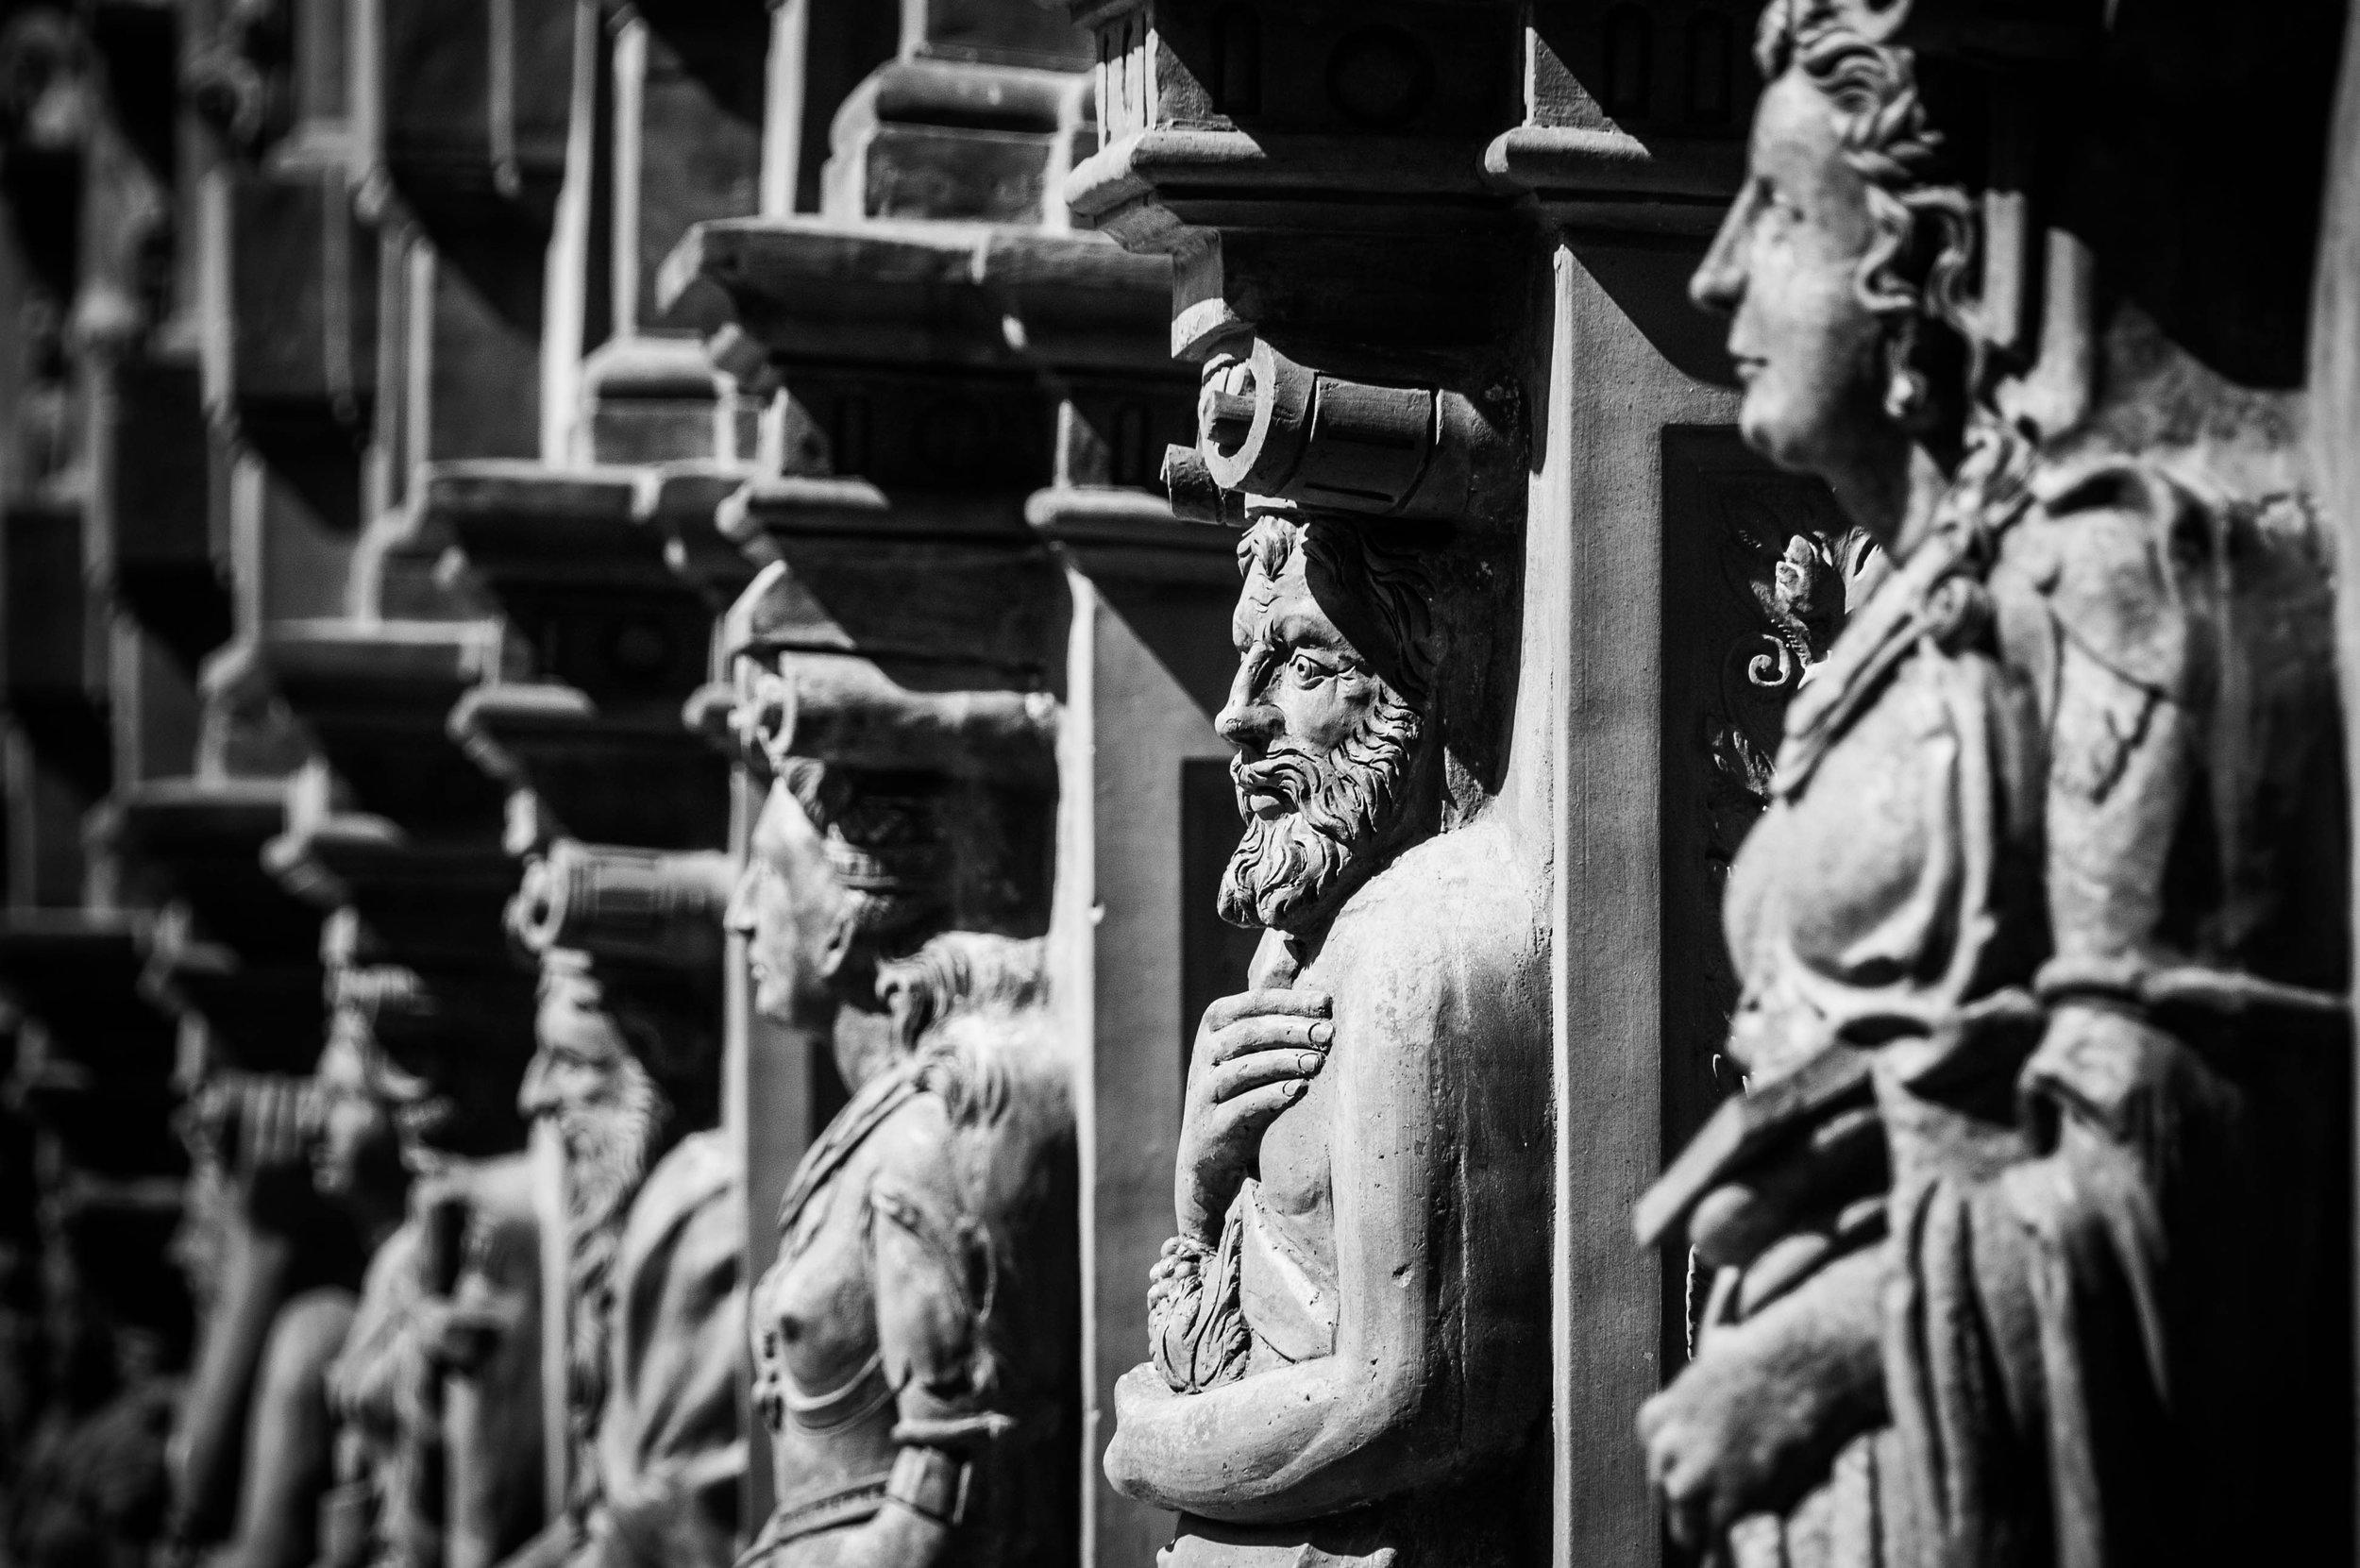 renaissance-schallaburg-figures-facade.jpg